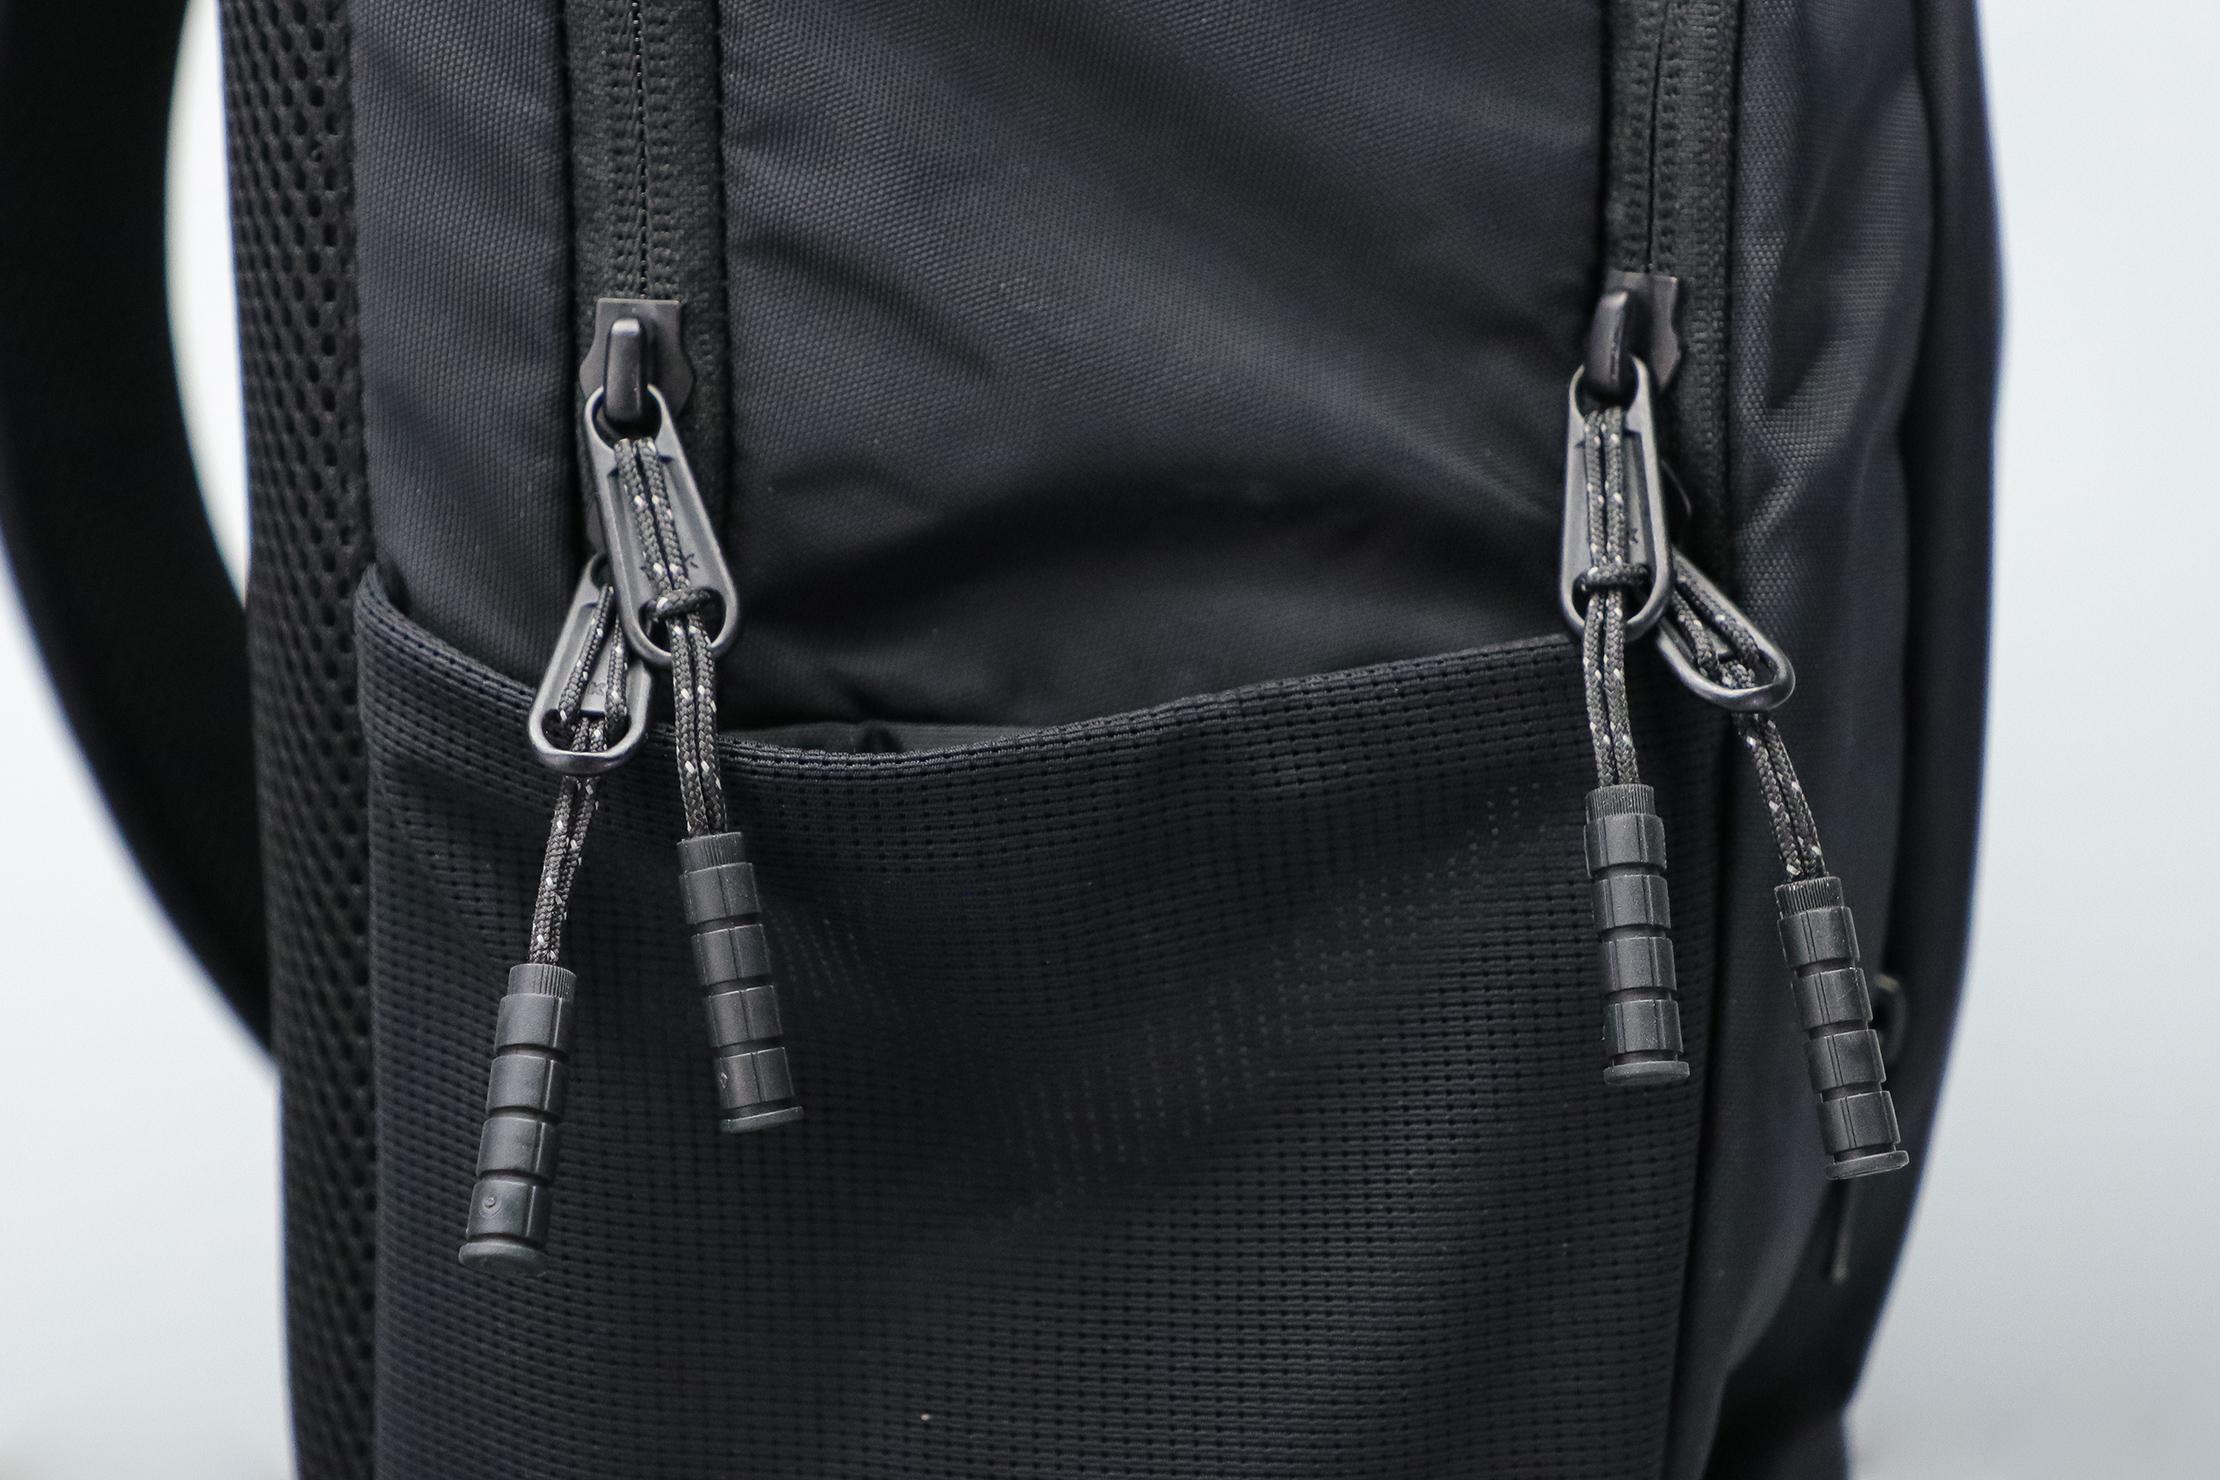 Timbuk2 Parkside Laptop Backpack 2.0 Zippers